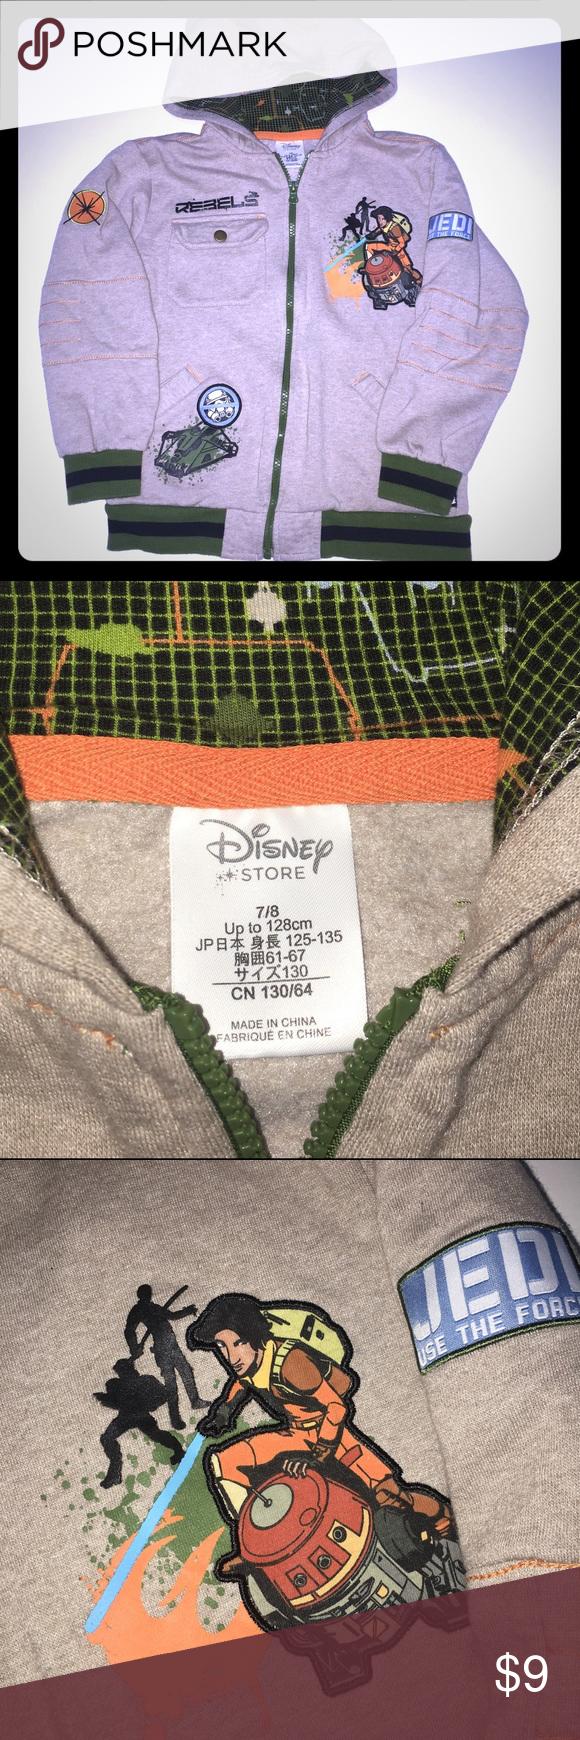 Boys character hoodie In excellent condition Disney Shirts & Tops Sweatshirts & Hoodies